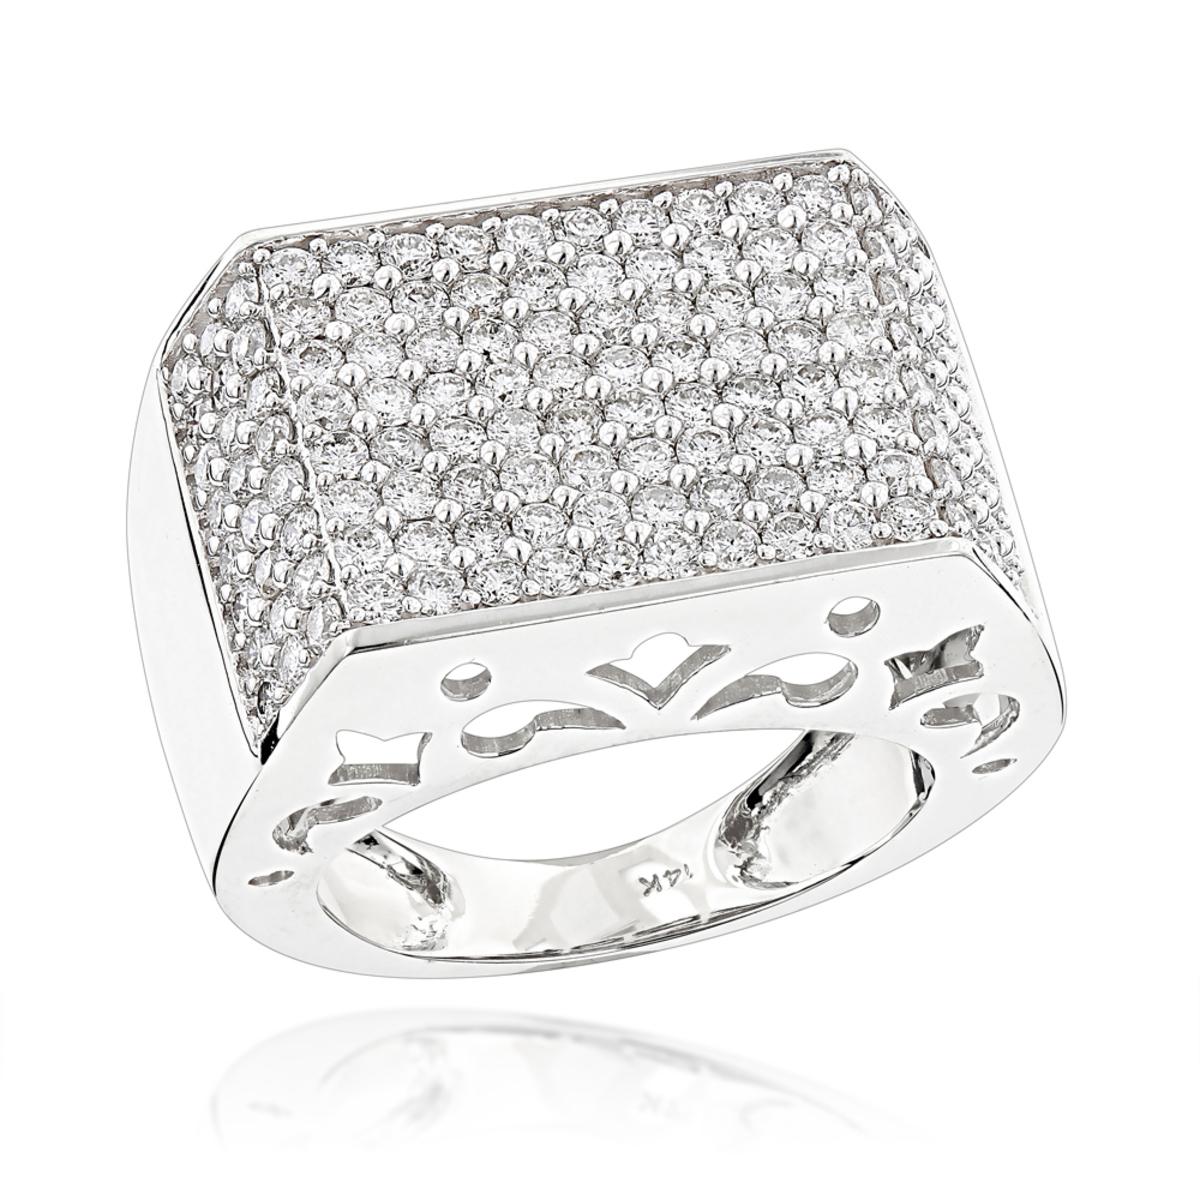 14K Gold Pave Diamond Ring For Men 4 Carat by Luxurman